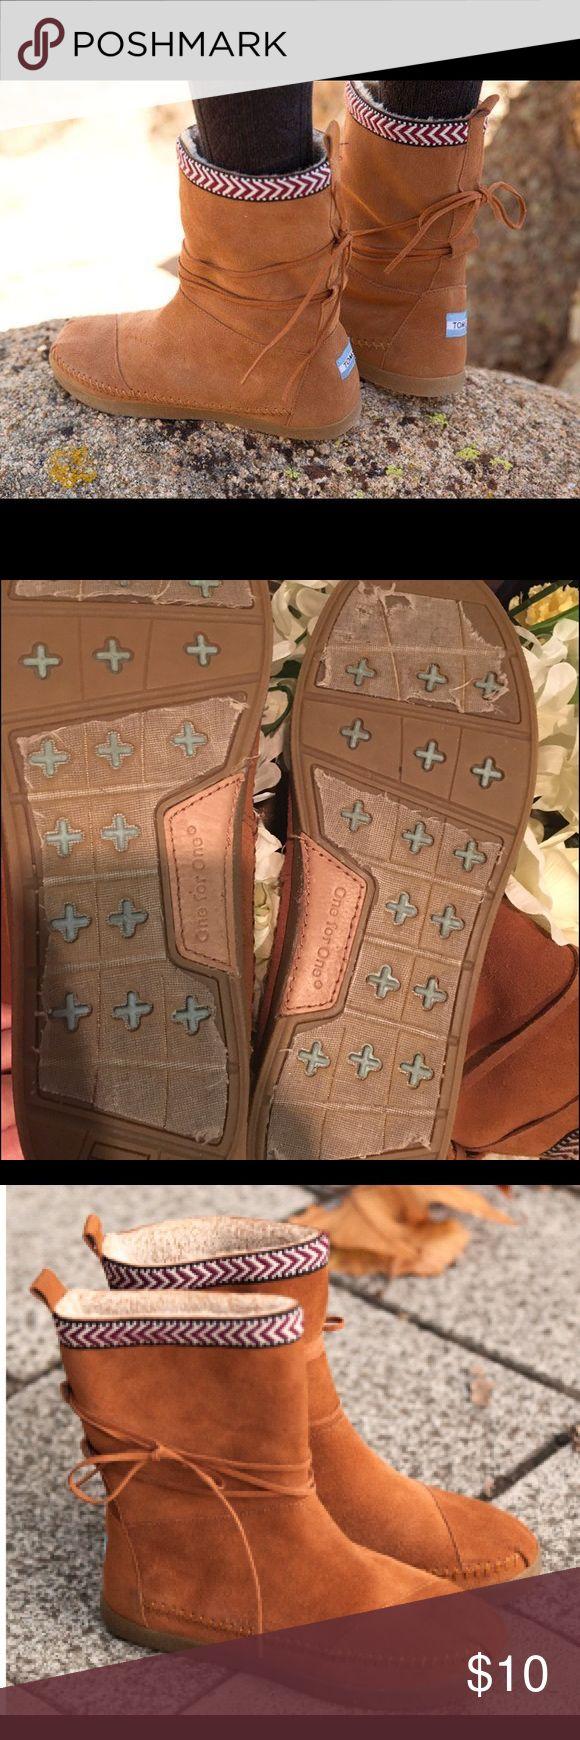 Cute! TOMS Nepal Boots // Mocassins // Size 7 Mint condition // TOMS Nepal Boots // size 7 TOMS Shoes Ankle Boots & Booties